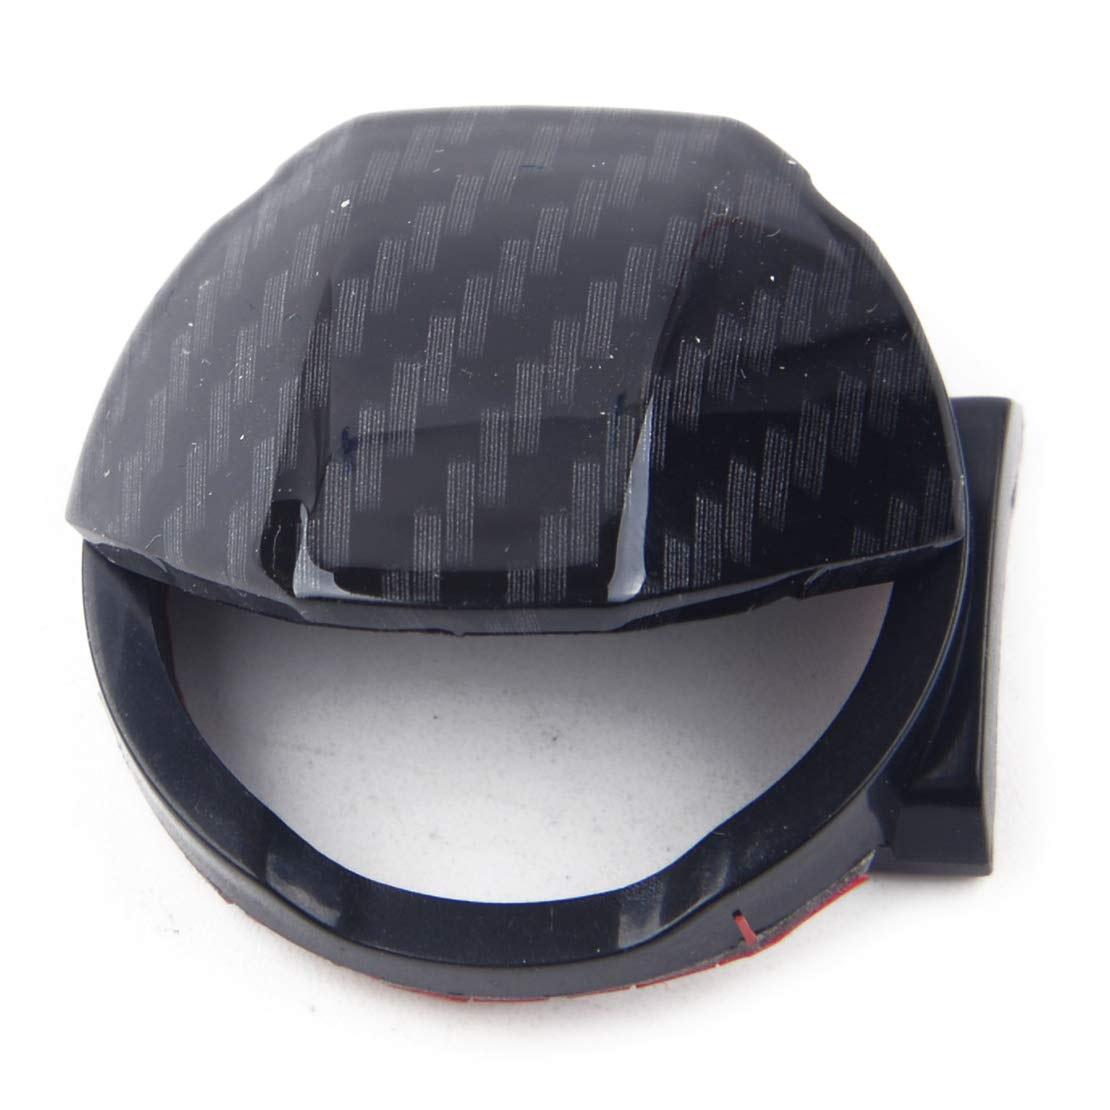 CITALL Auto Kohlefaser Stil Z/ündung Motor Start Stopp Taste Schalter Abdeckung Kappe Abdeckung Trimmung